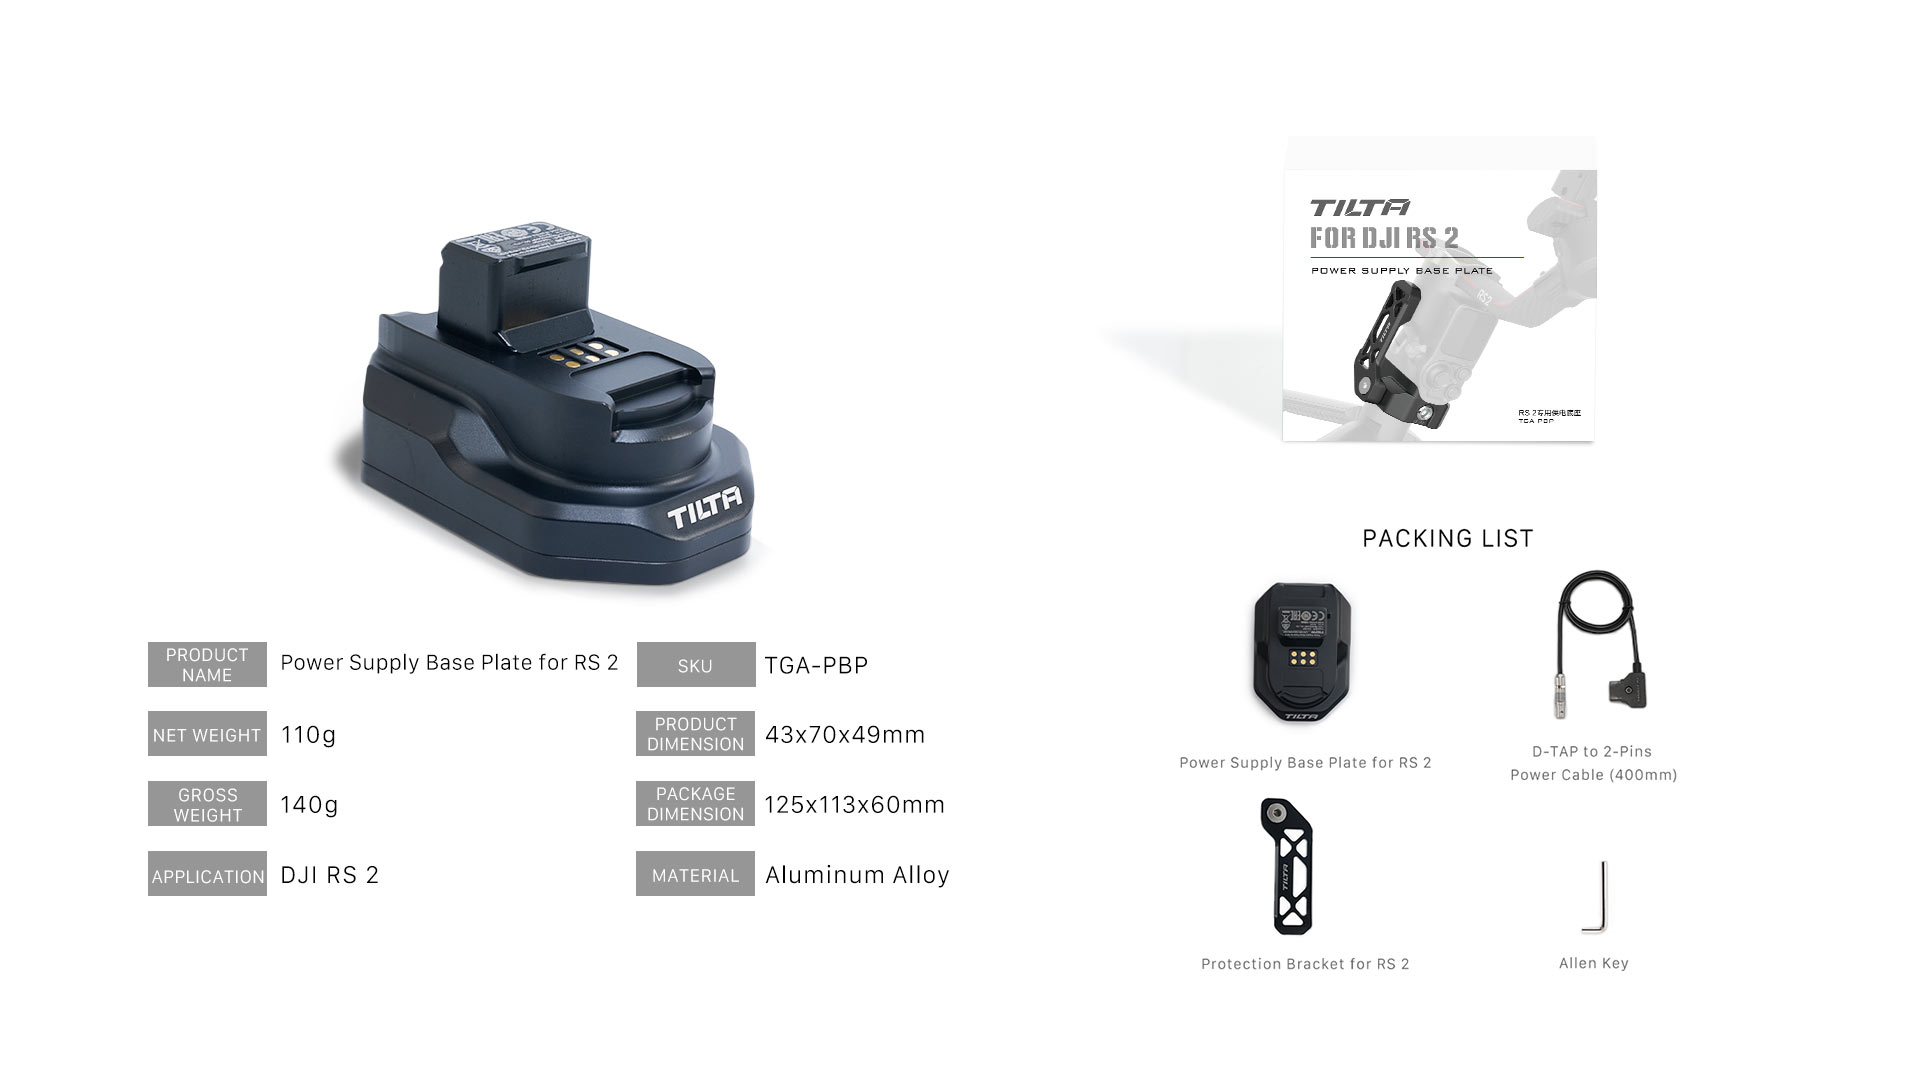 TGA-PBP tech specs & packing list